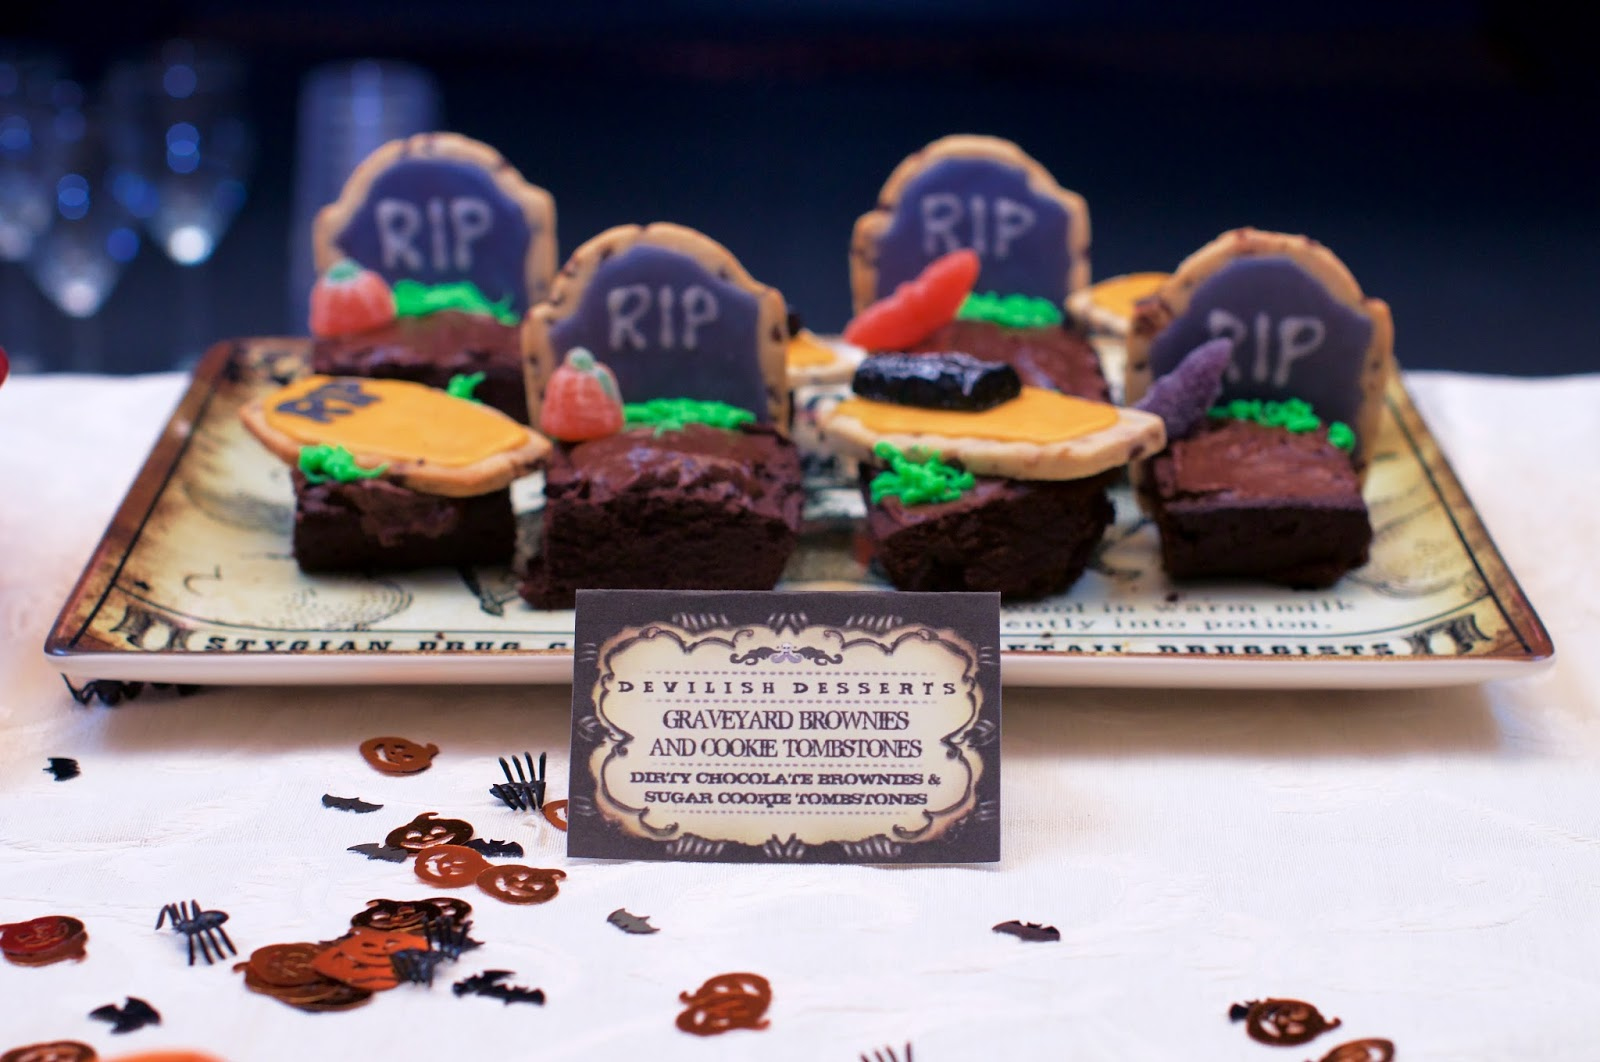 Boo-tiful Cookies and Brownies!